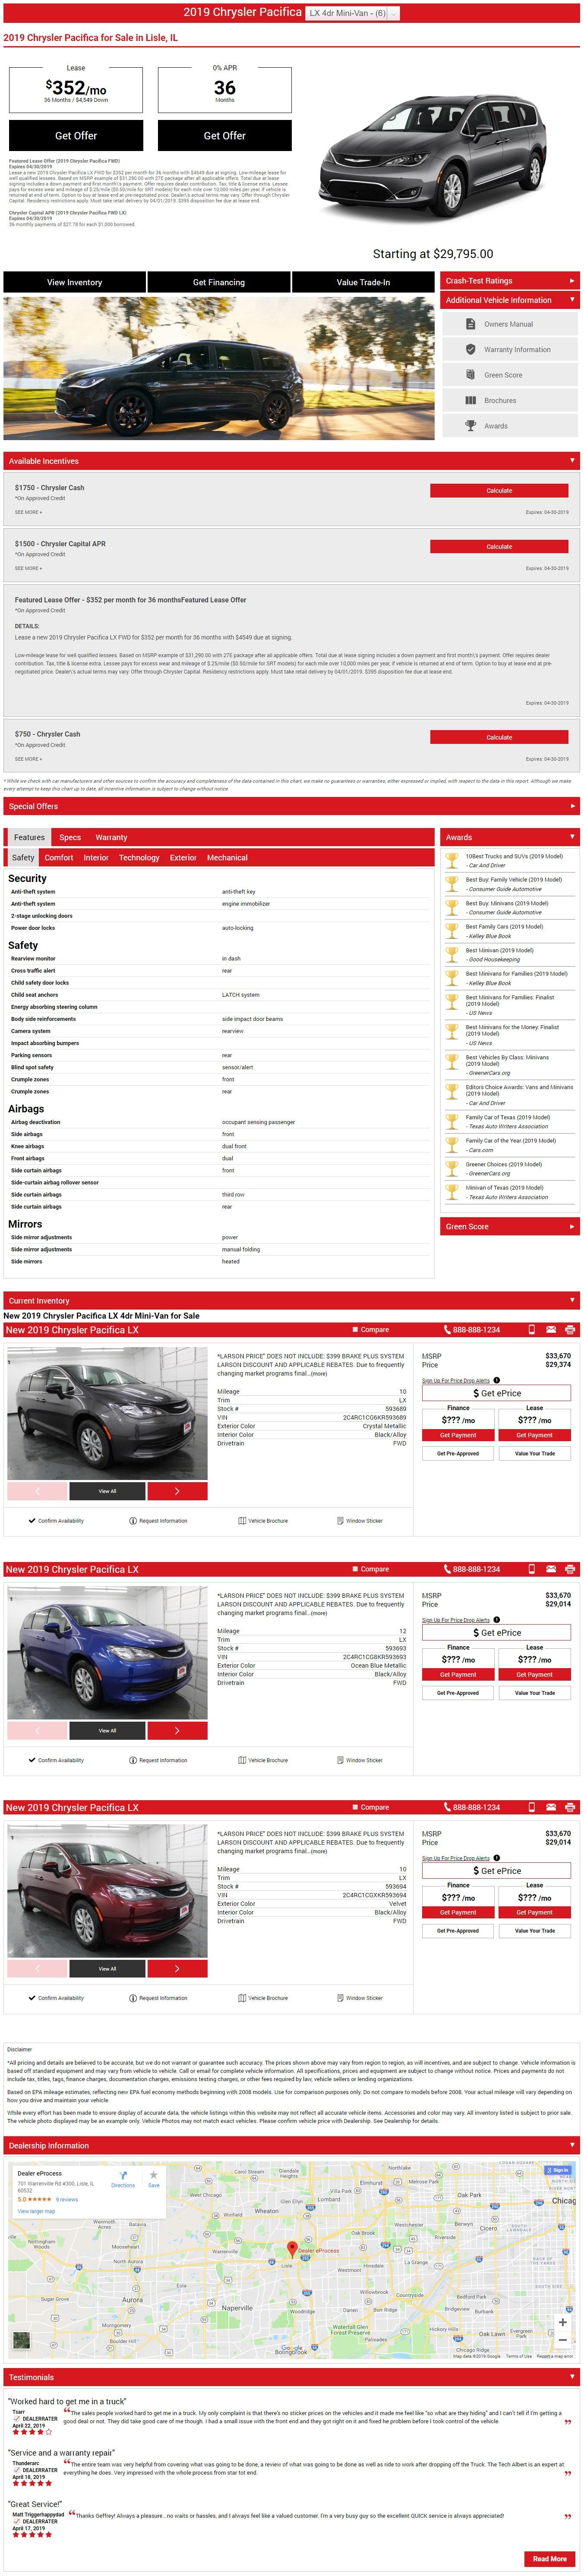 dynamic lease offer full screen image